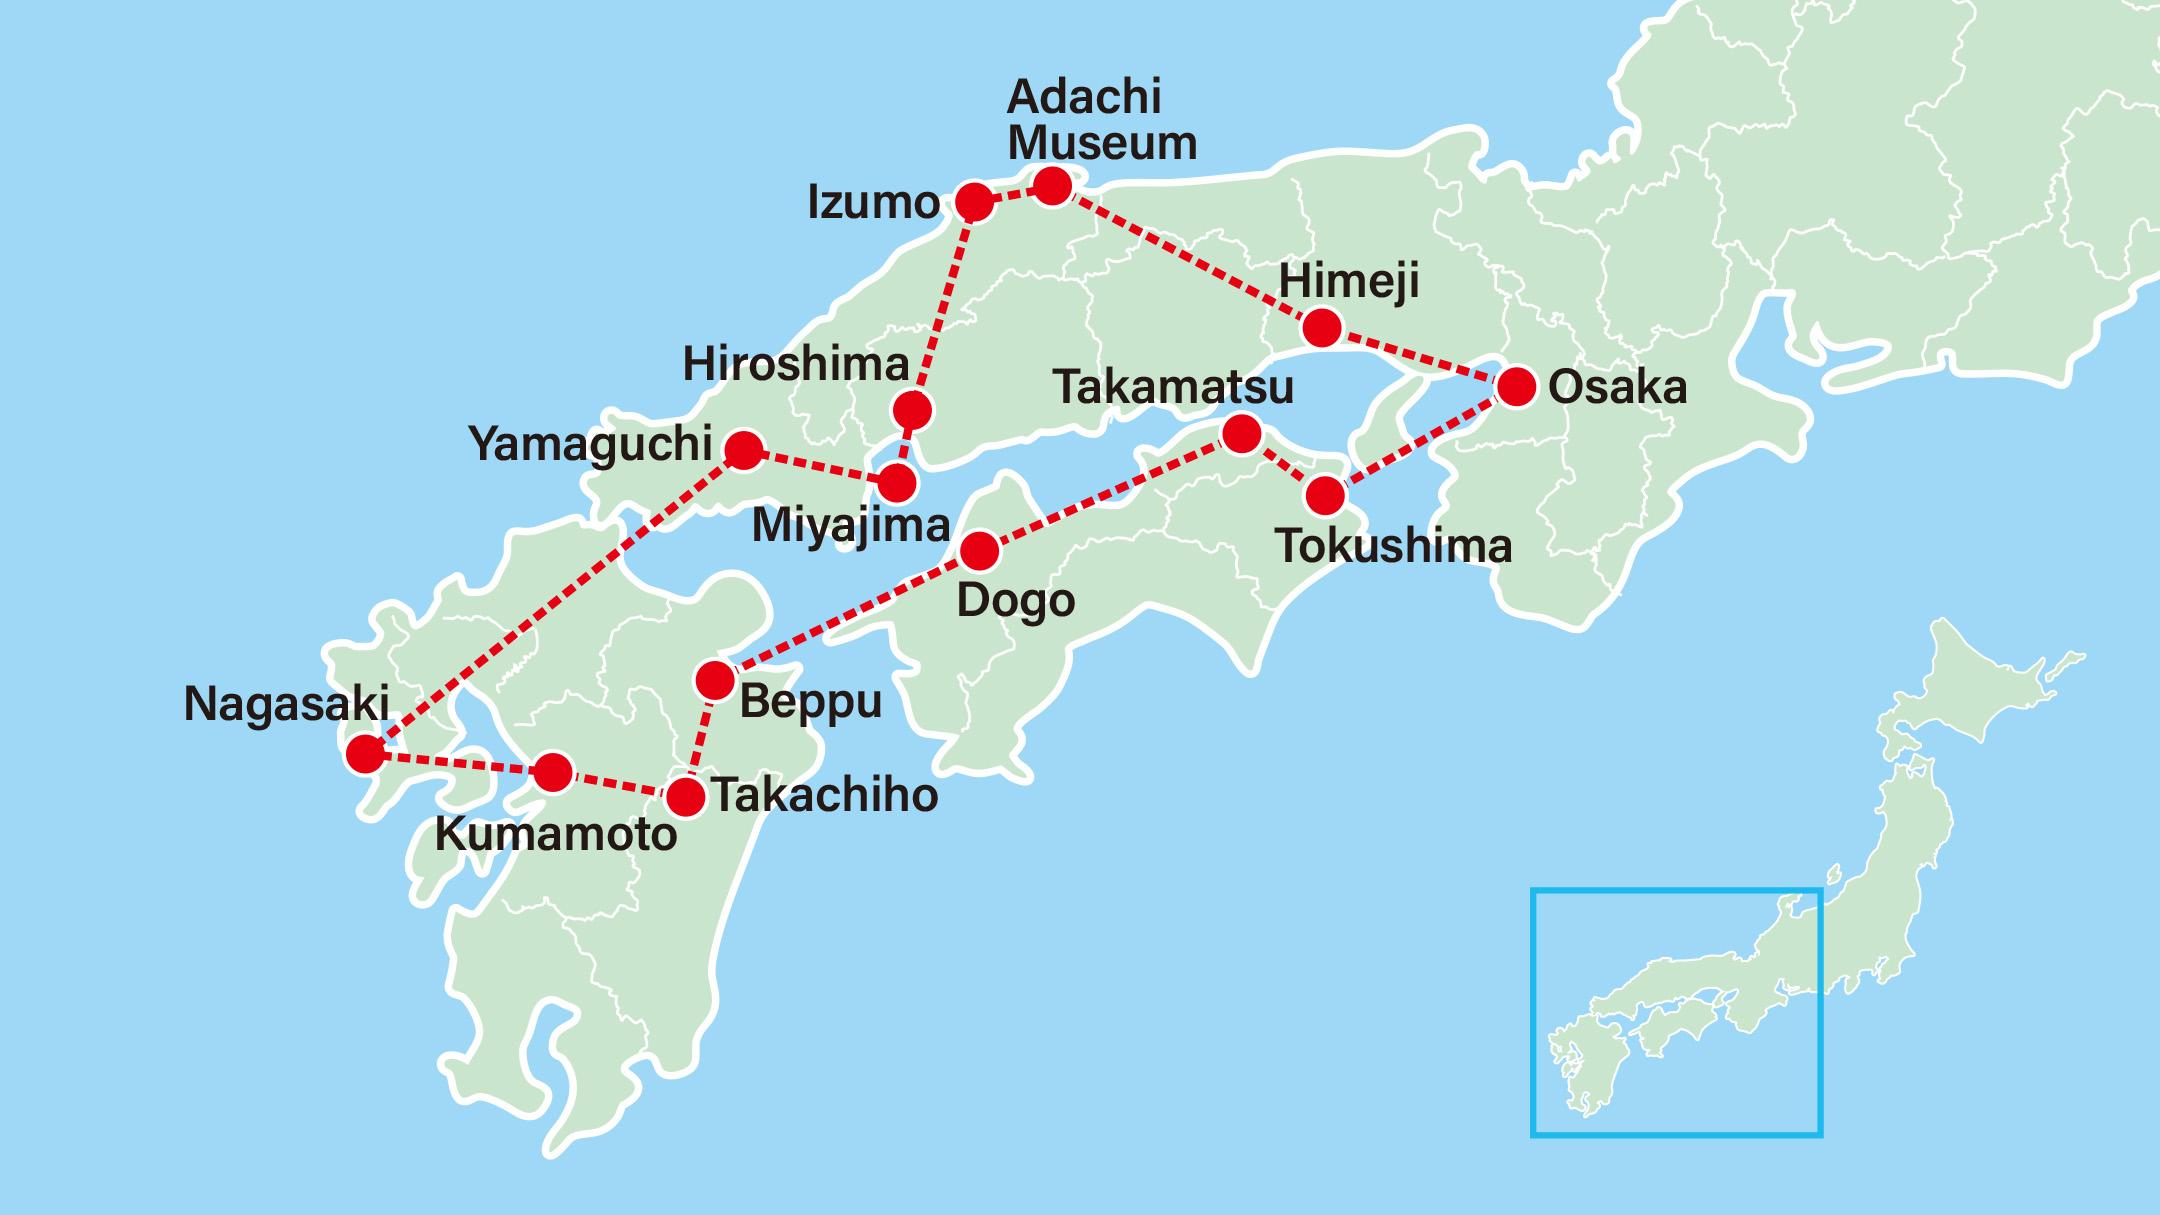 Southern Japan Tours-Adachi Museum-Hiroshima-Miyajima-Nagasaki-Kumamoto-Takachiho-Beppu-Dogo-Ritsurin Garden-Osaka